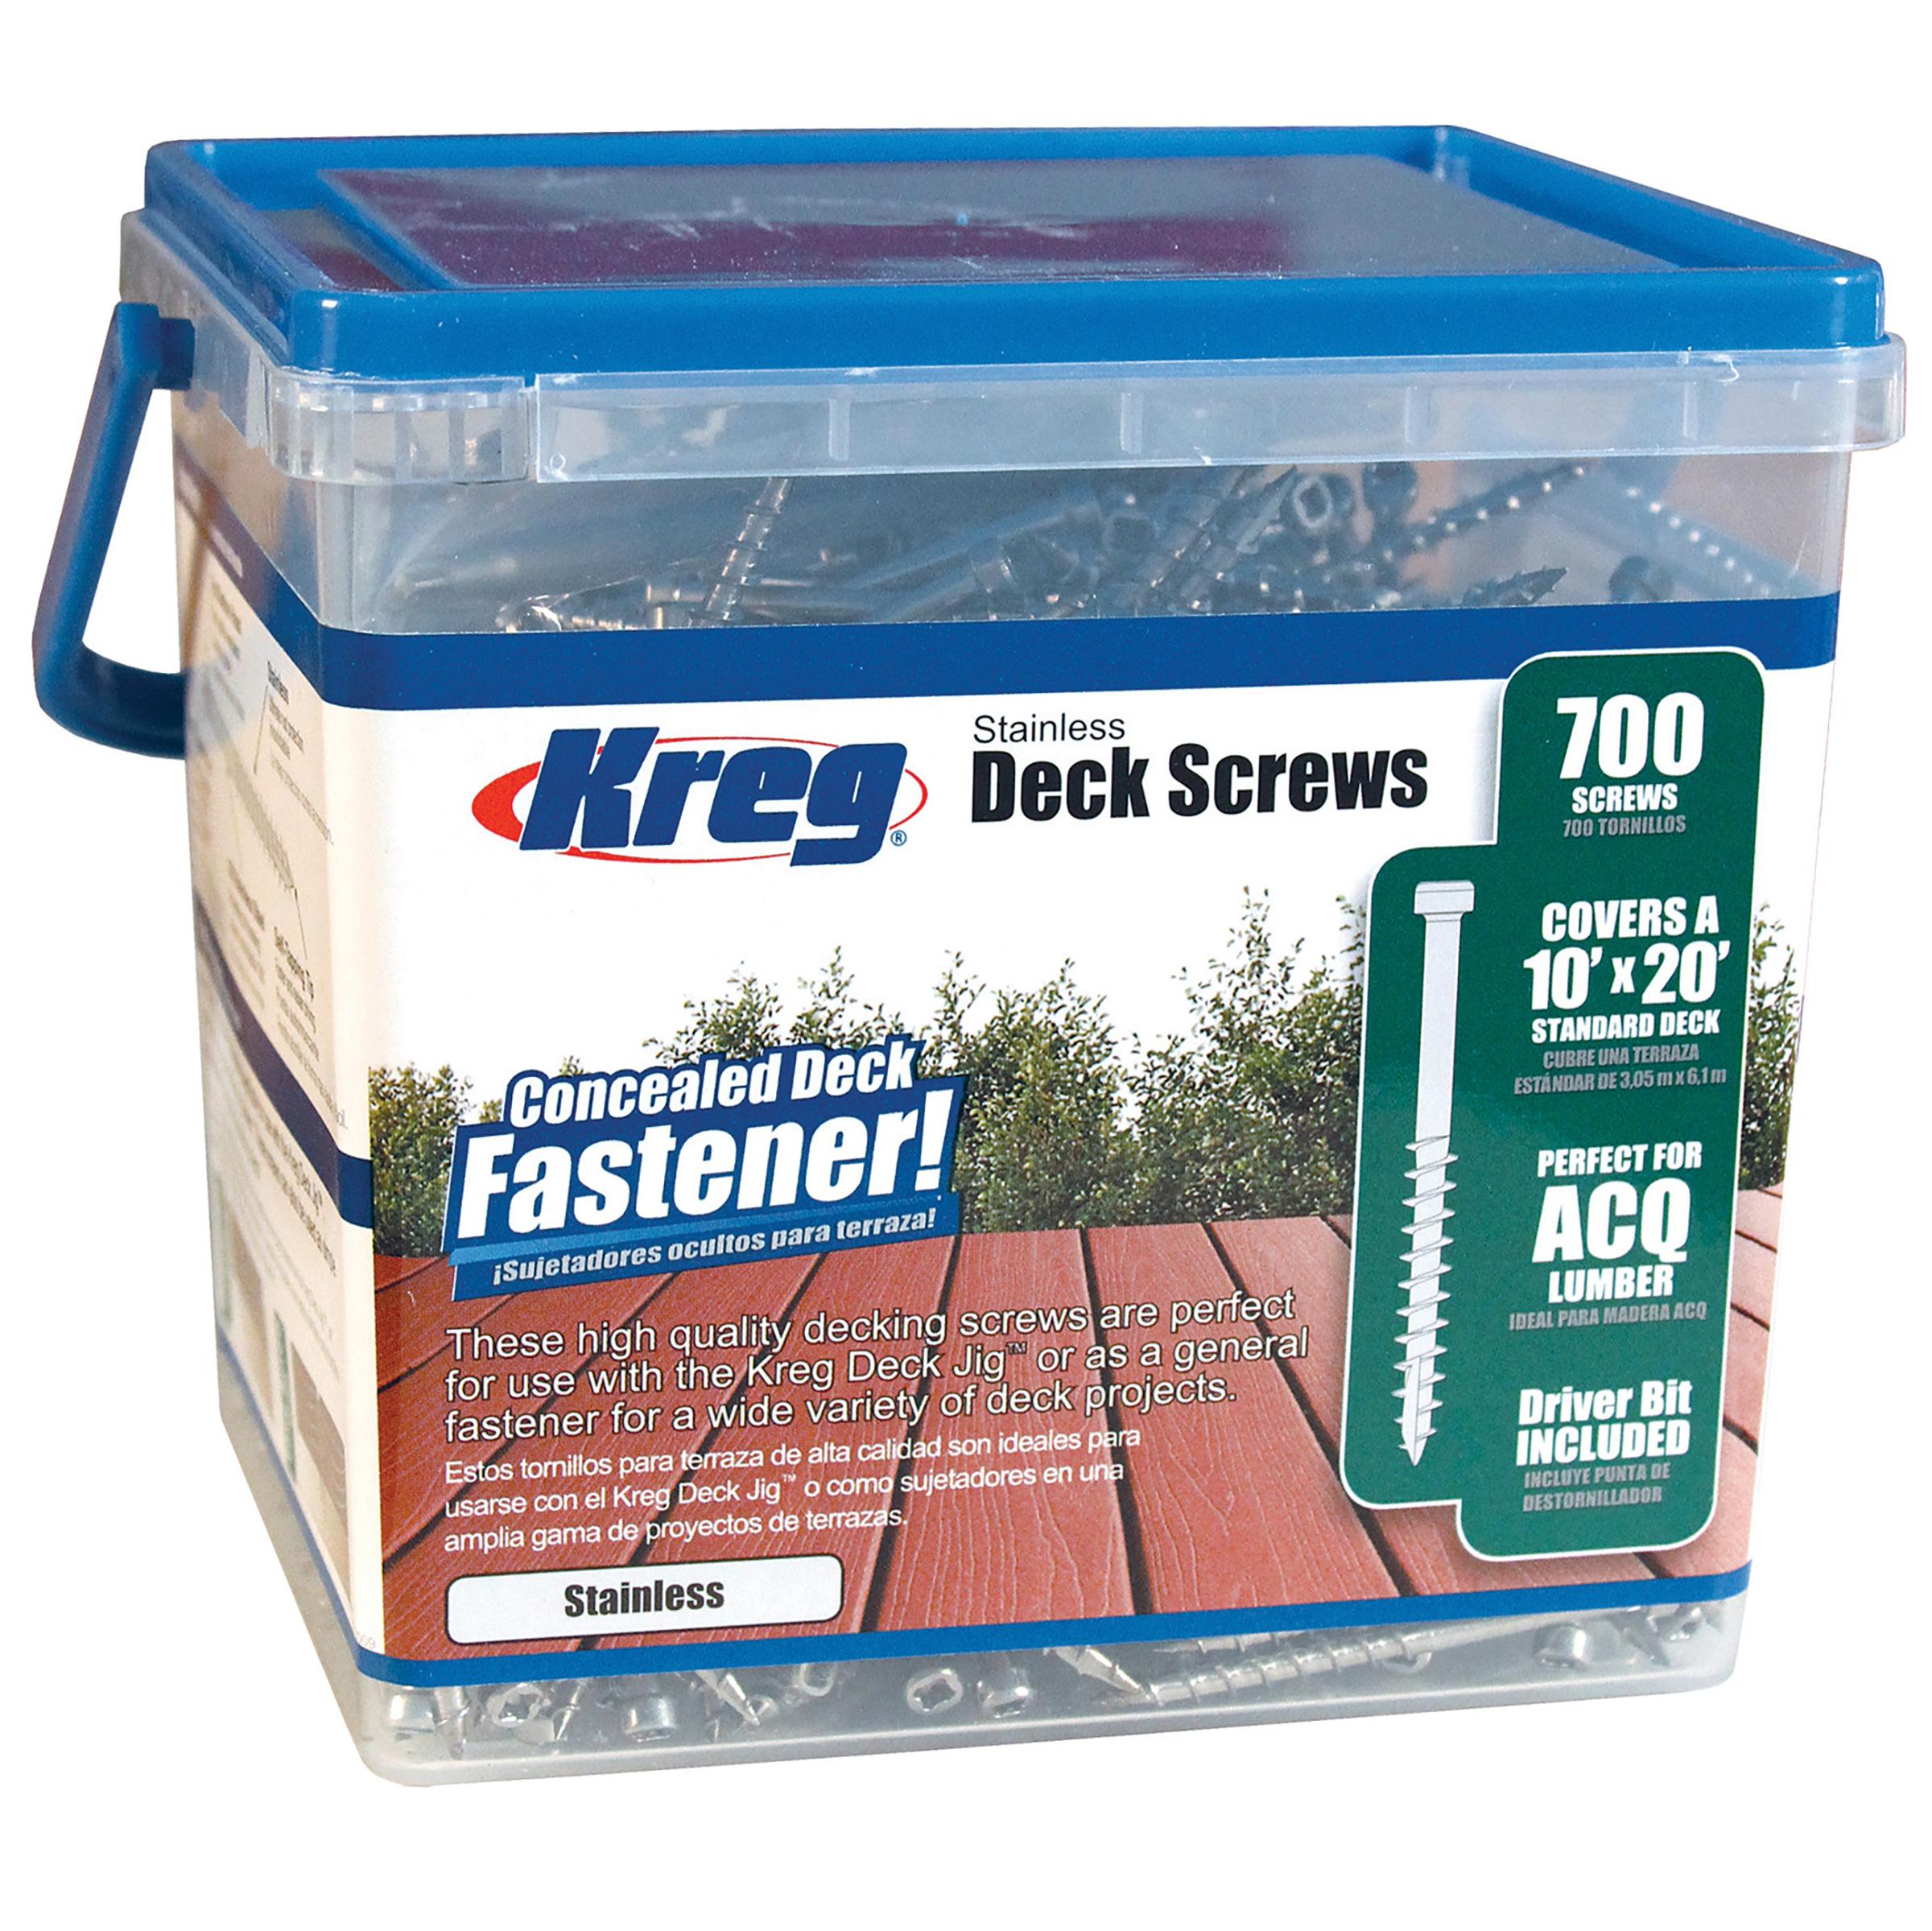 Stainless Deck Screws - 700ct.